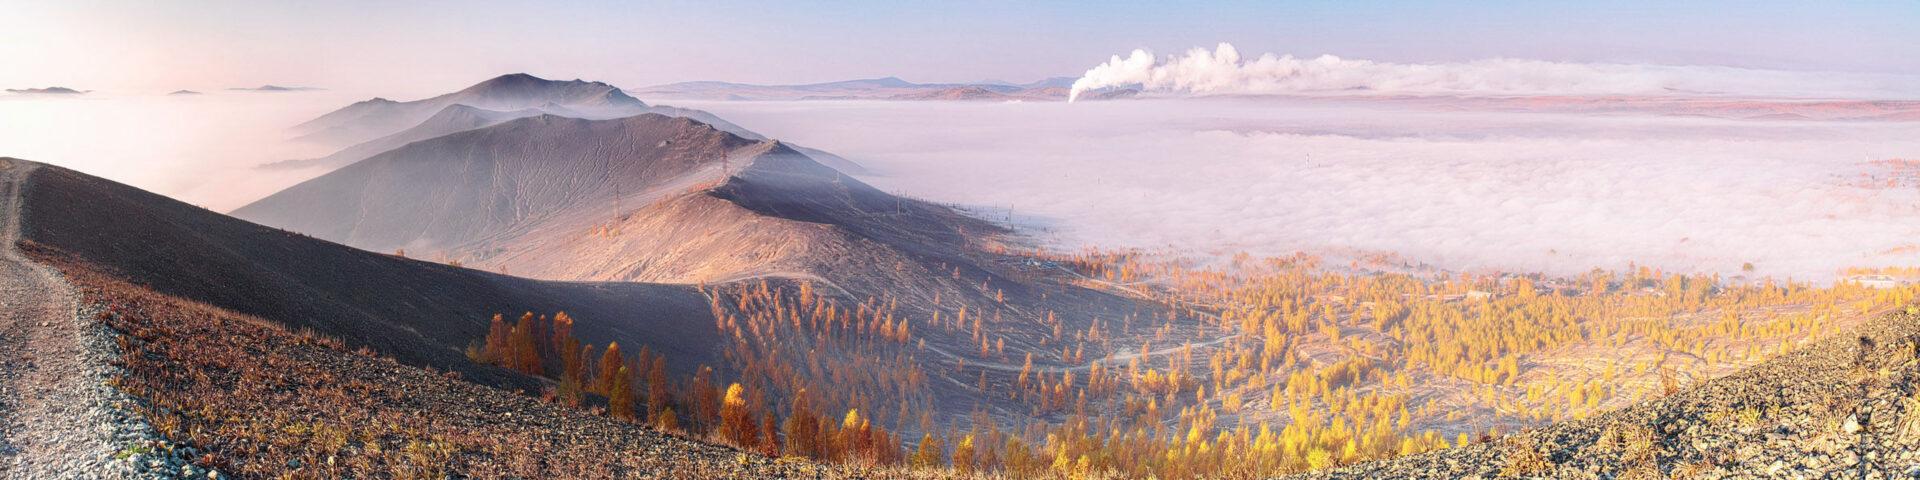 Туманный Карабаш